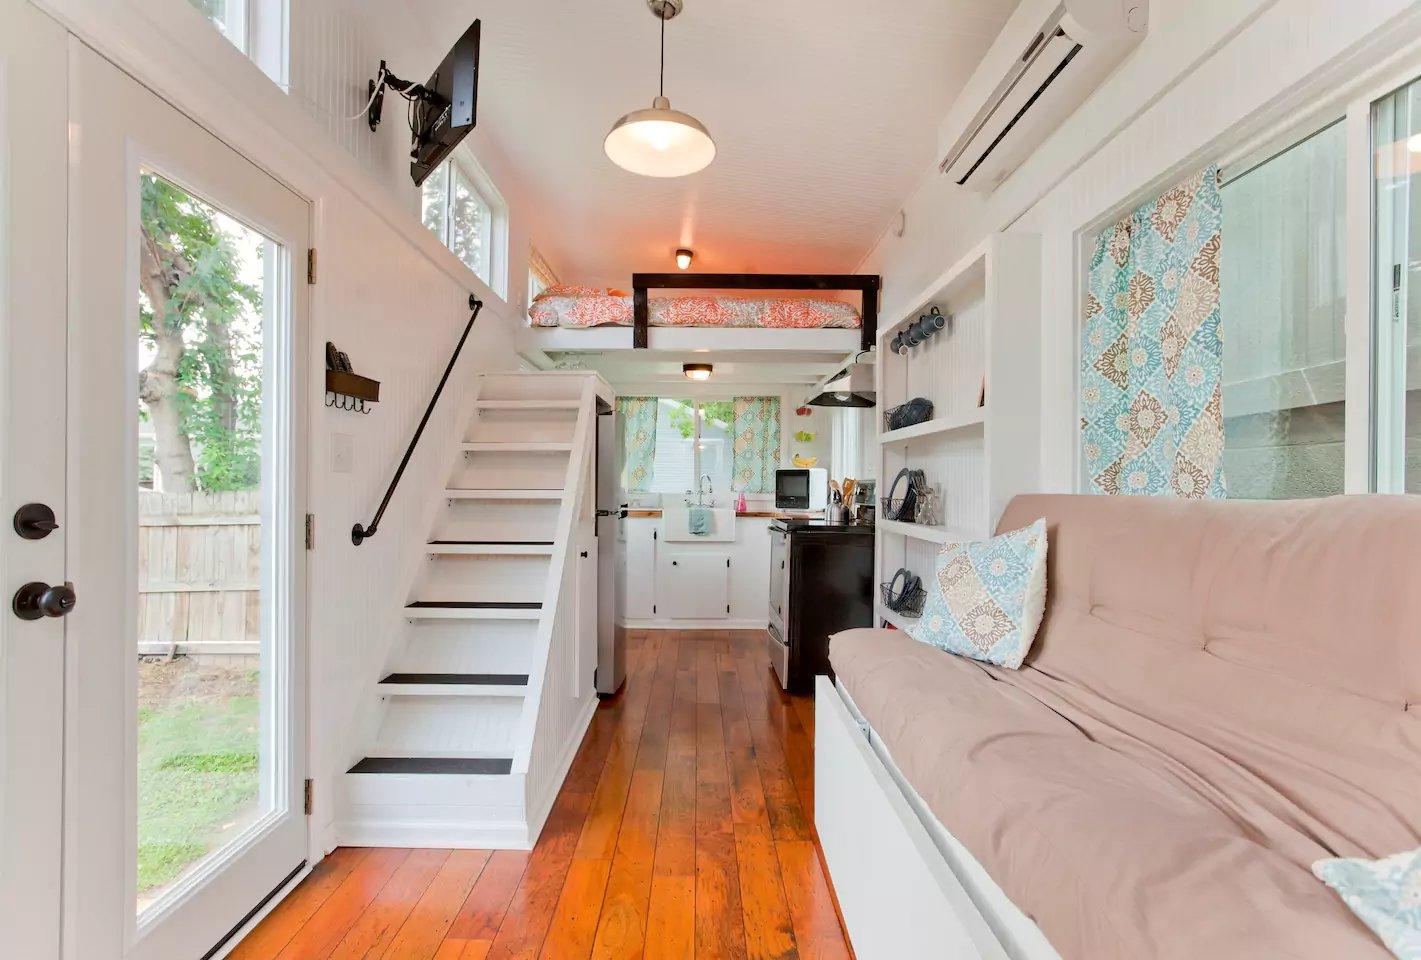 Music_City_Tennessee_Tiny_Home_Inside_1.jpg